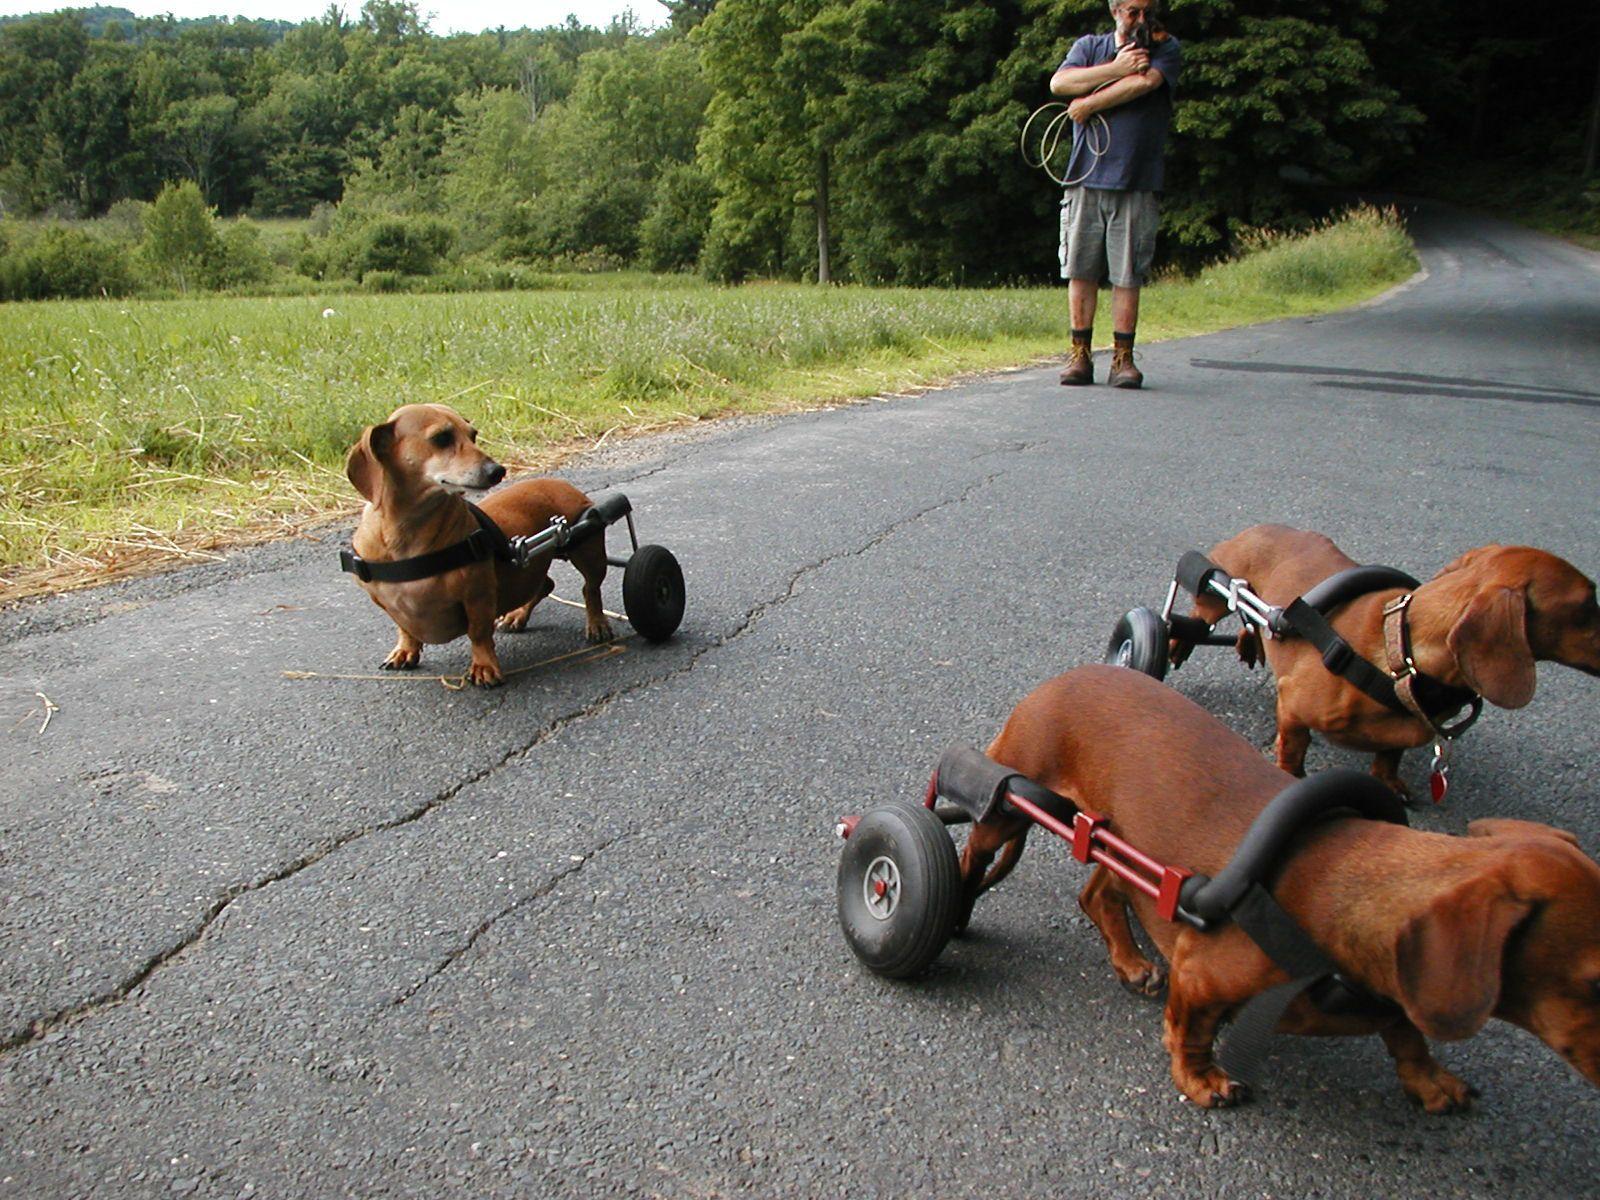 wheelchair dog revolving chair otobi pack of doxies in wheelchairs dachshund